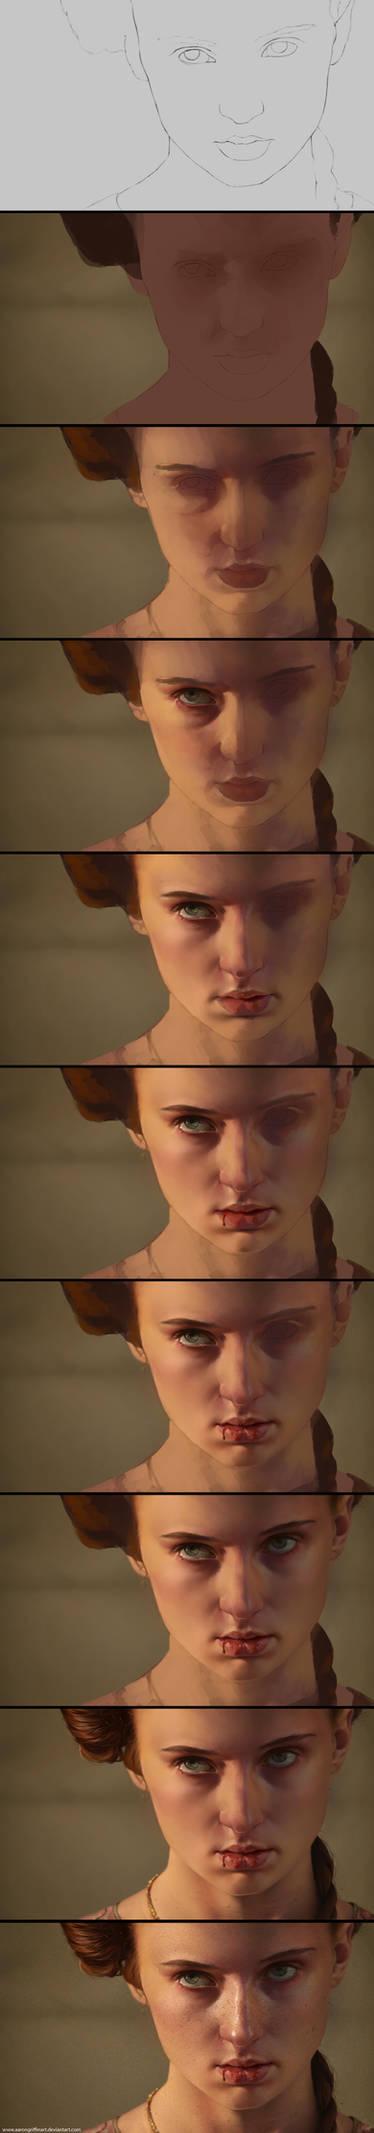 Sansa - Game of Thrones Process by AaronGriffinArt